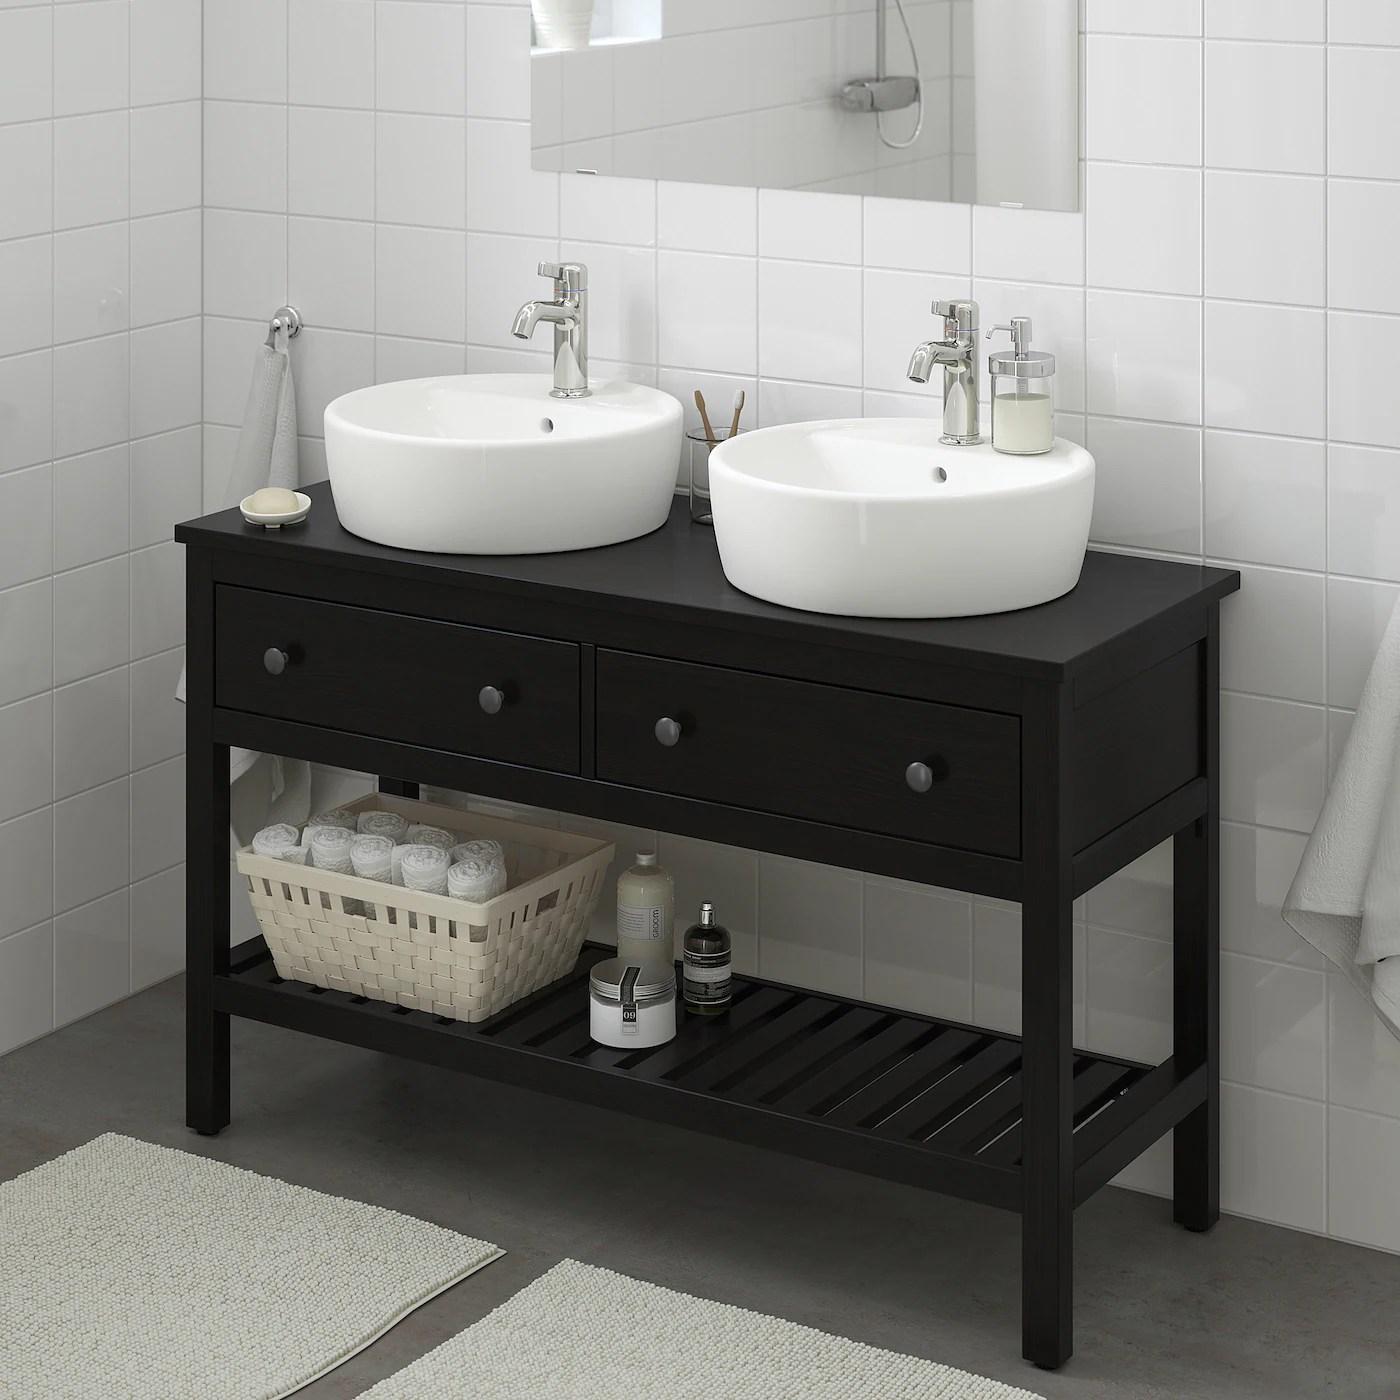 hemnes tornviken open sink cabinet with 17 sink black brown stained voxnan faucet 48x18 7 8x35 3 8